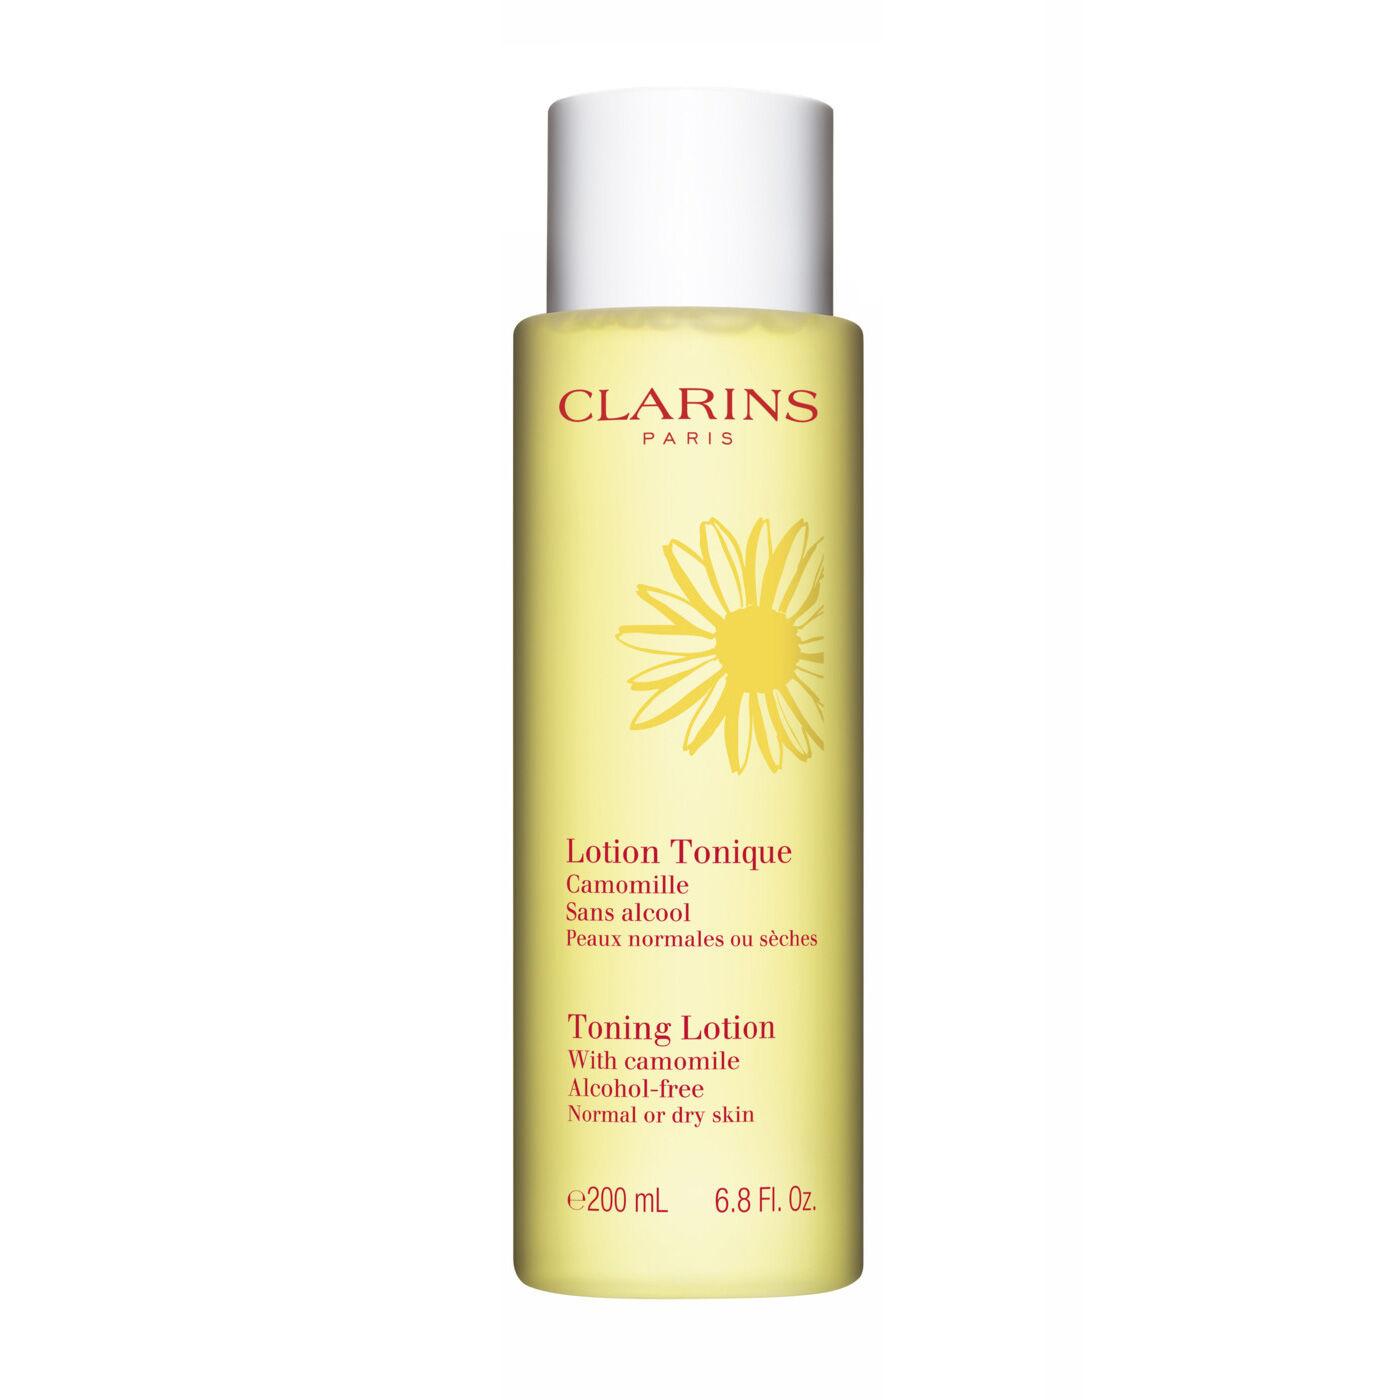 Reinigungslotion Tonique Camomille - normale/trockene Haut